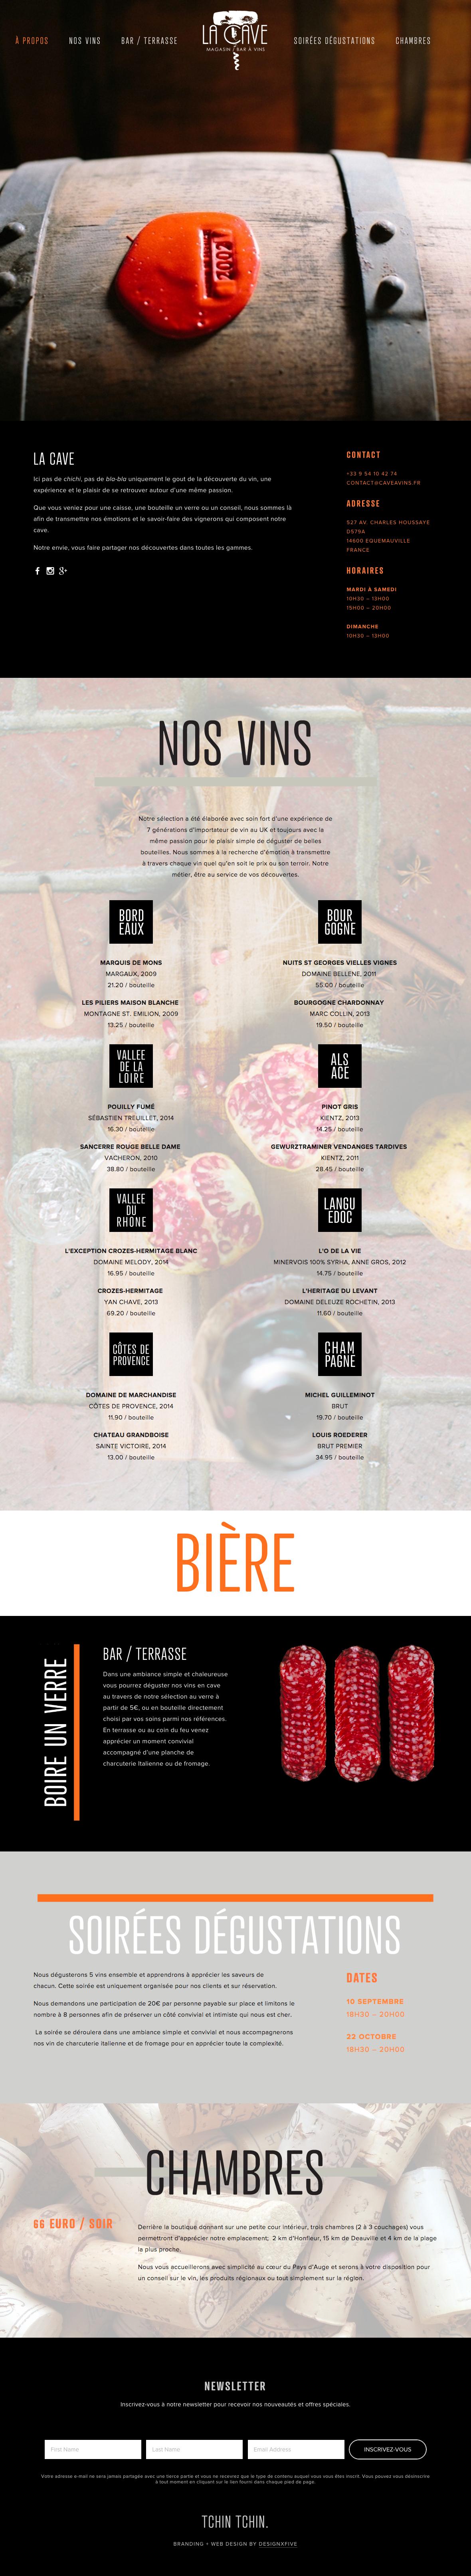 la-cave-web-design-x-five-small-business-wine-shop